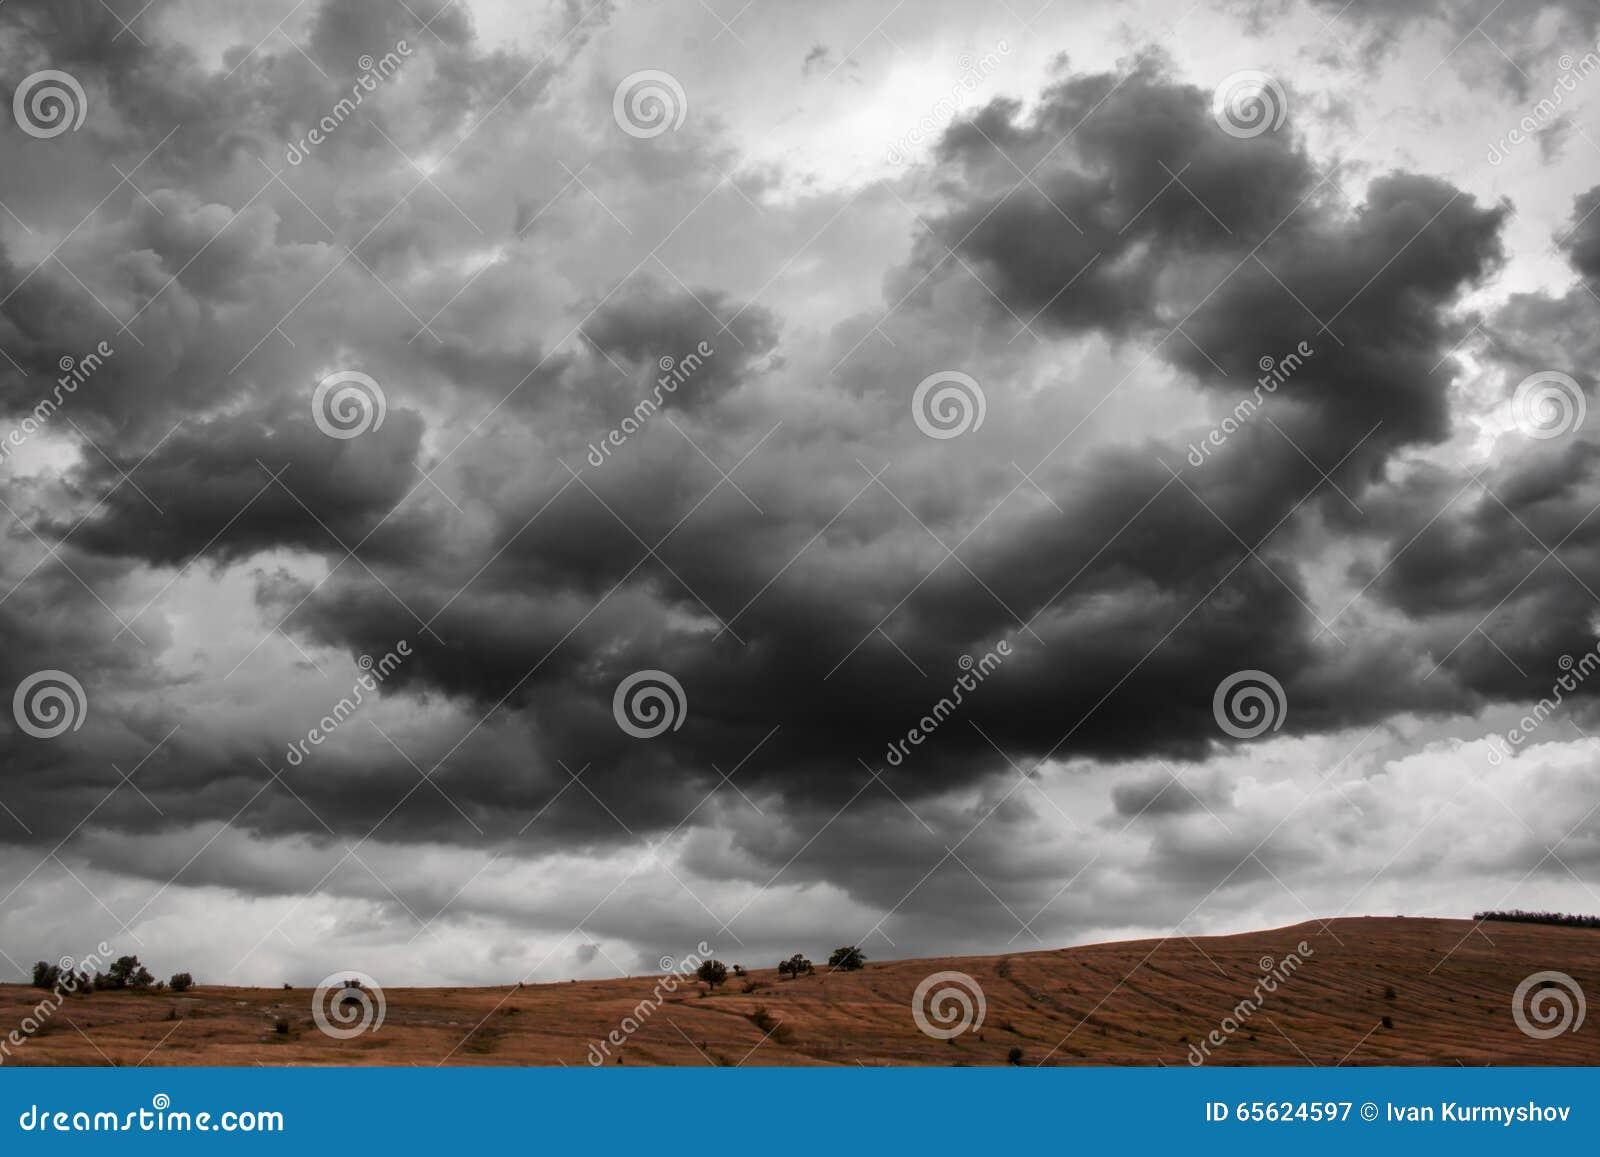 Dramatic Thunder Storm Clouds Background. Nature Landscape